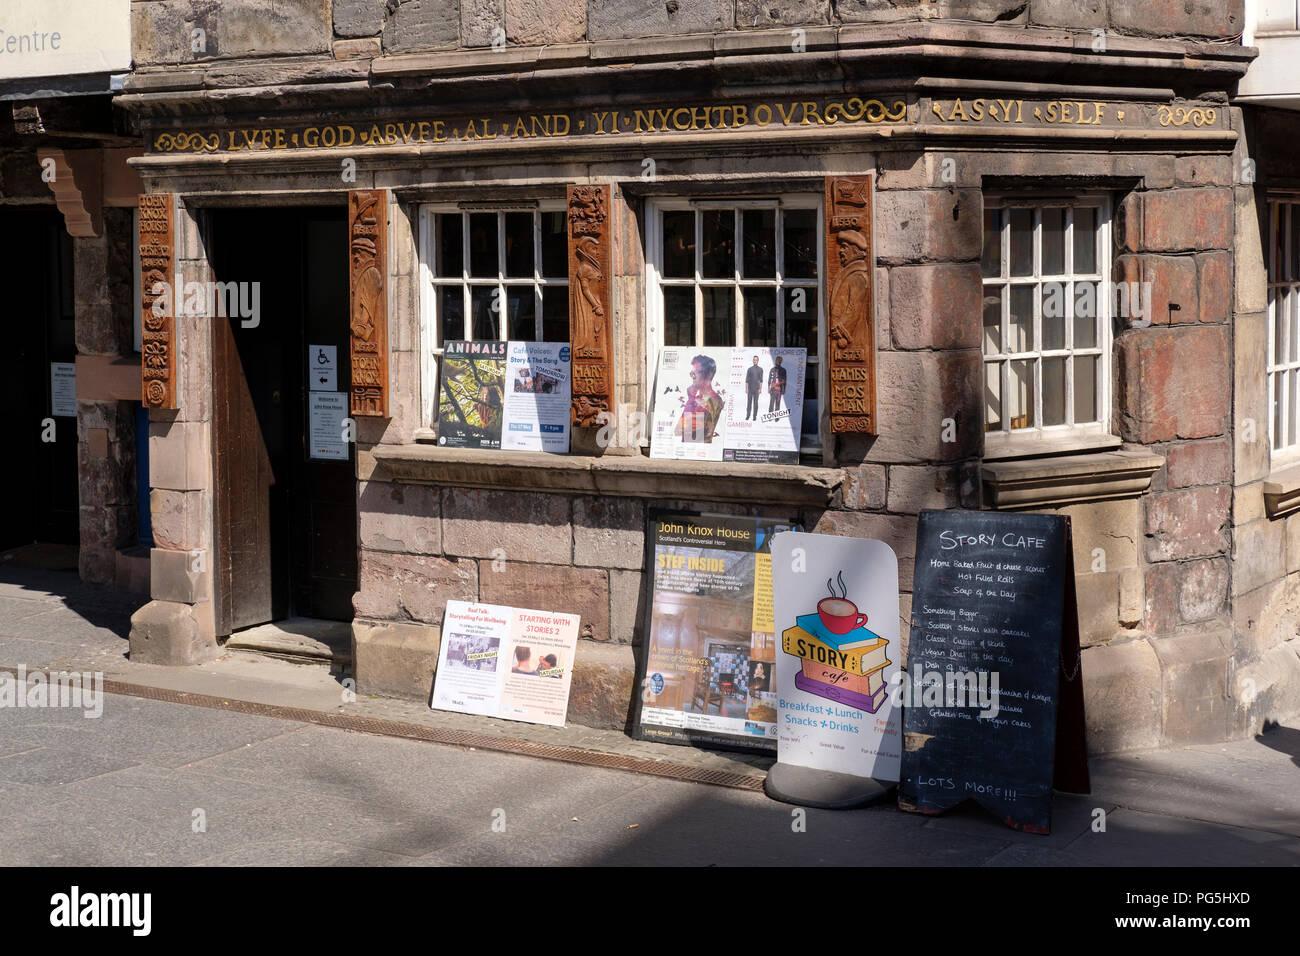 The entrance to John Knox House, on the Royal Mile, Edinburgh. Stock Photo